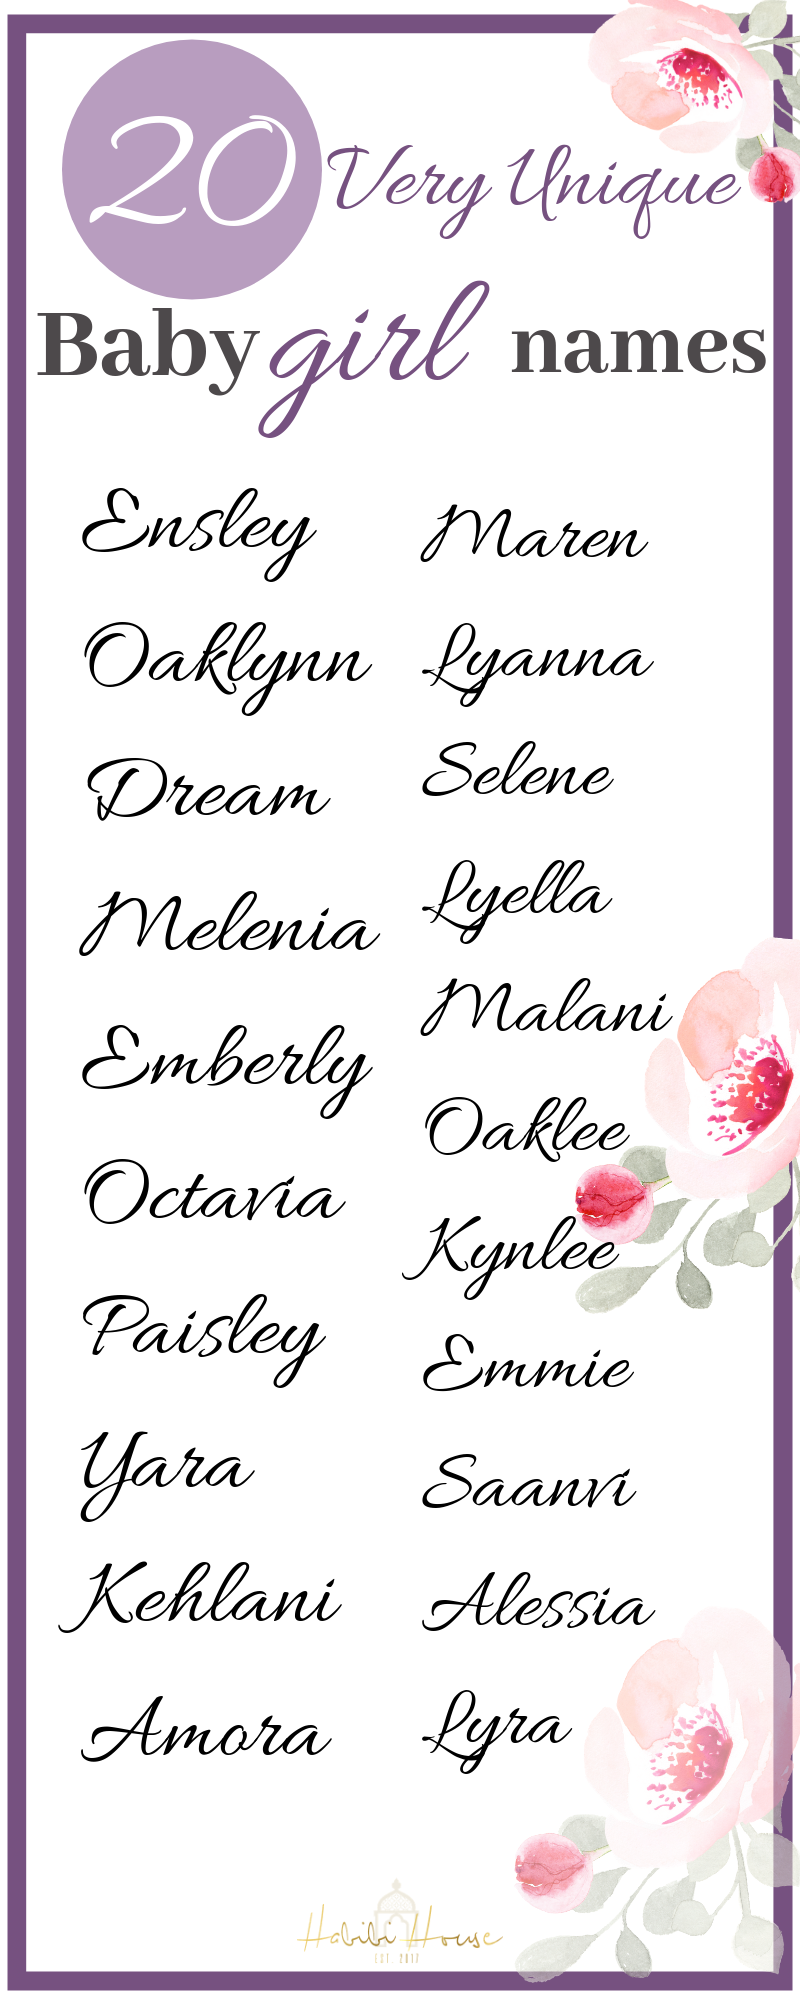 Very Unique Baby Girl Names